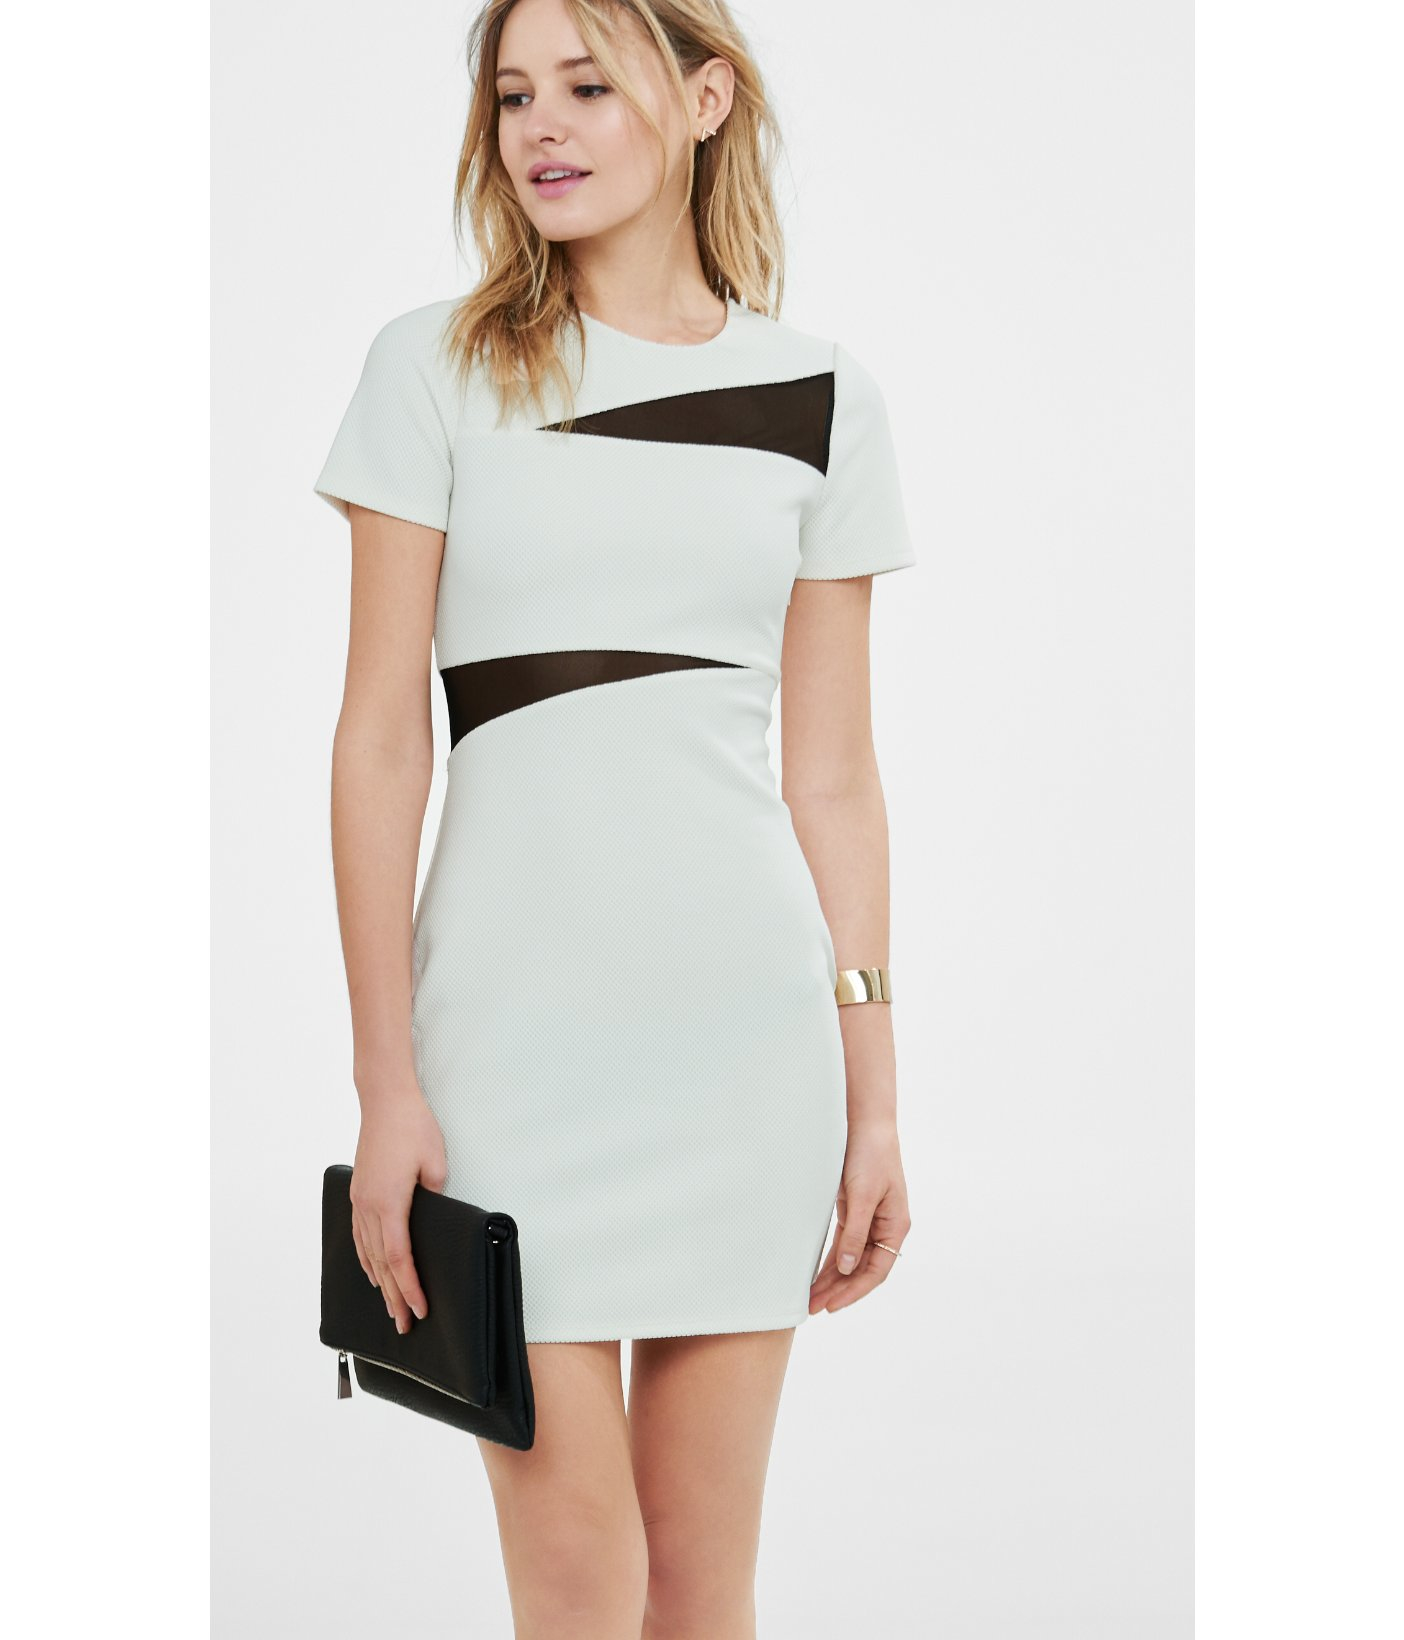 61907dfd Express Ivory Mesh Inset Jacquard Sheath Dress in Black - Lyst